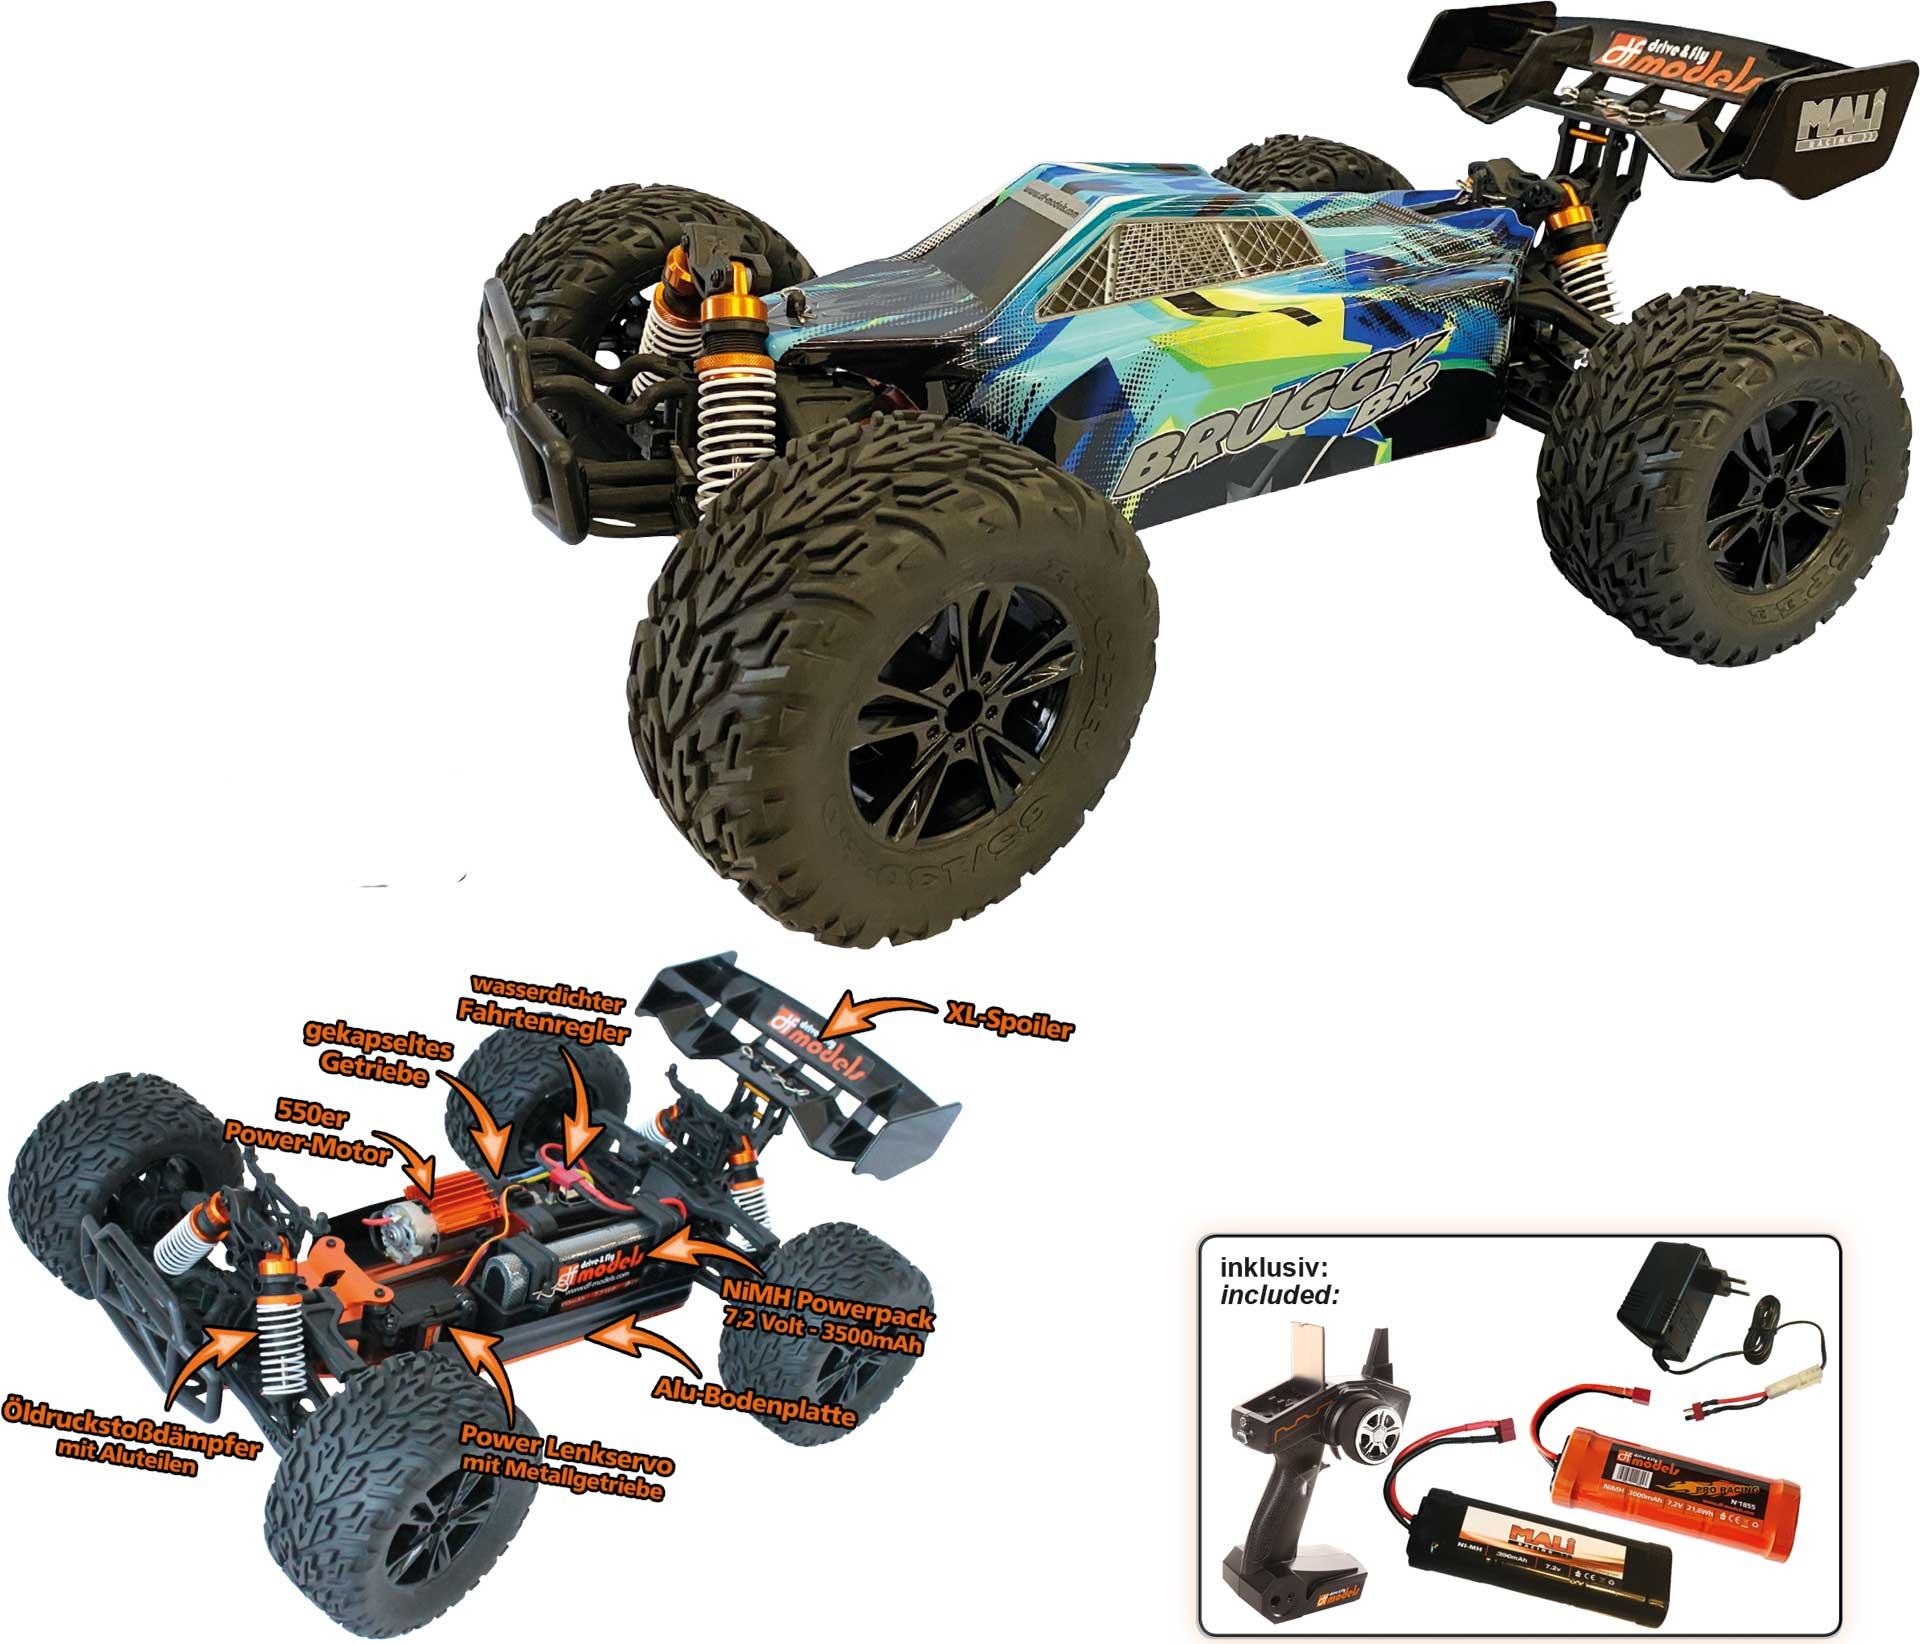 DRIVE & FLY MODELS Bruggy BR brushed 1/10XL RTR EP 4WD inklusive 2. Akku gratis